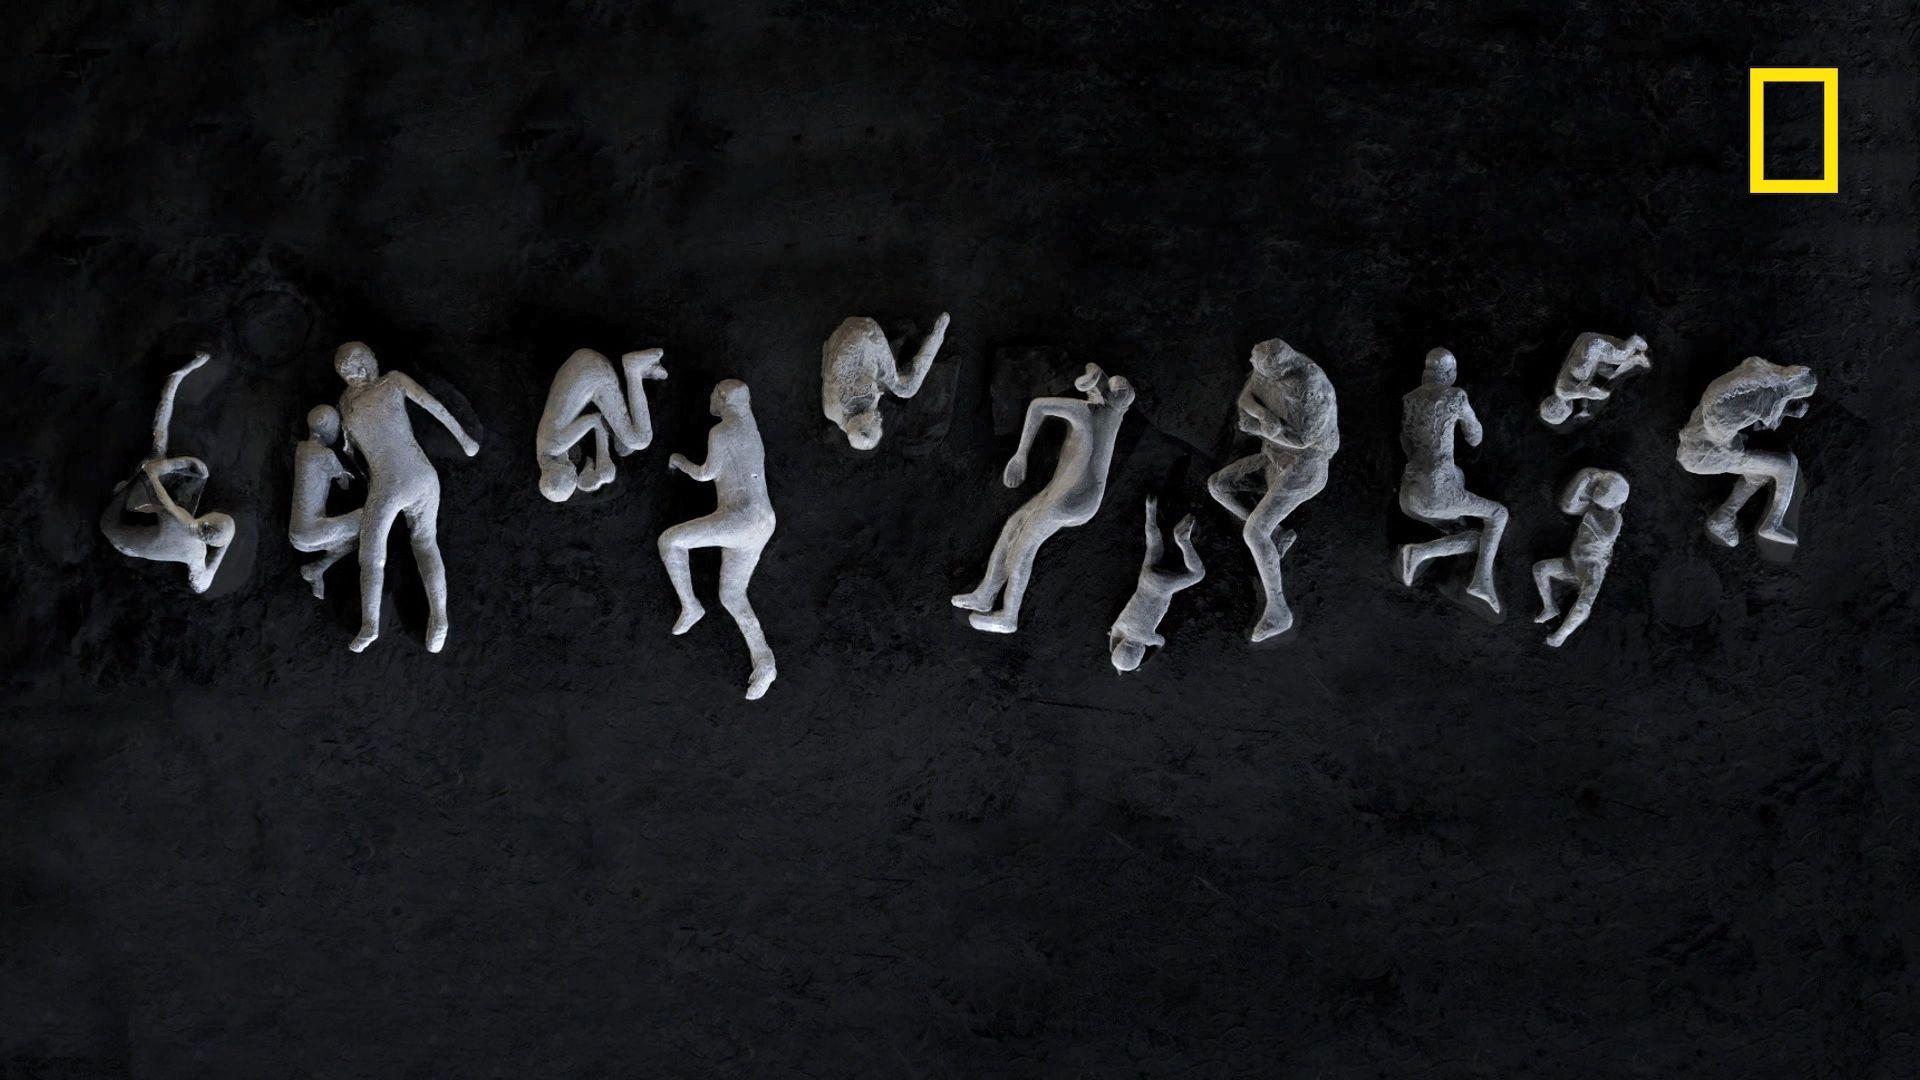 poudlard//chambre d/'exigence métal mural signe Harry potter collection//cadeau//fun